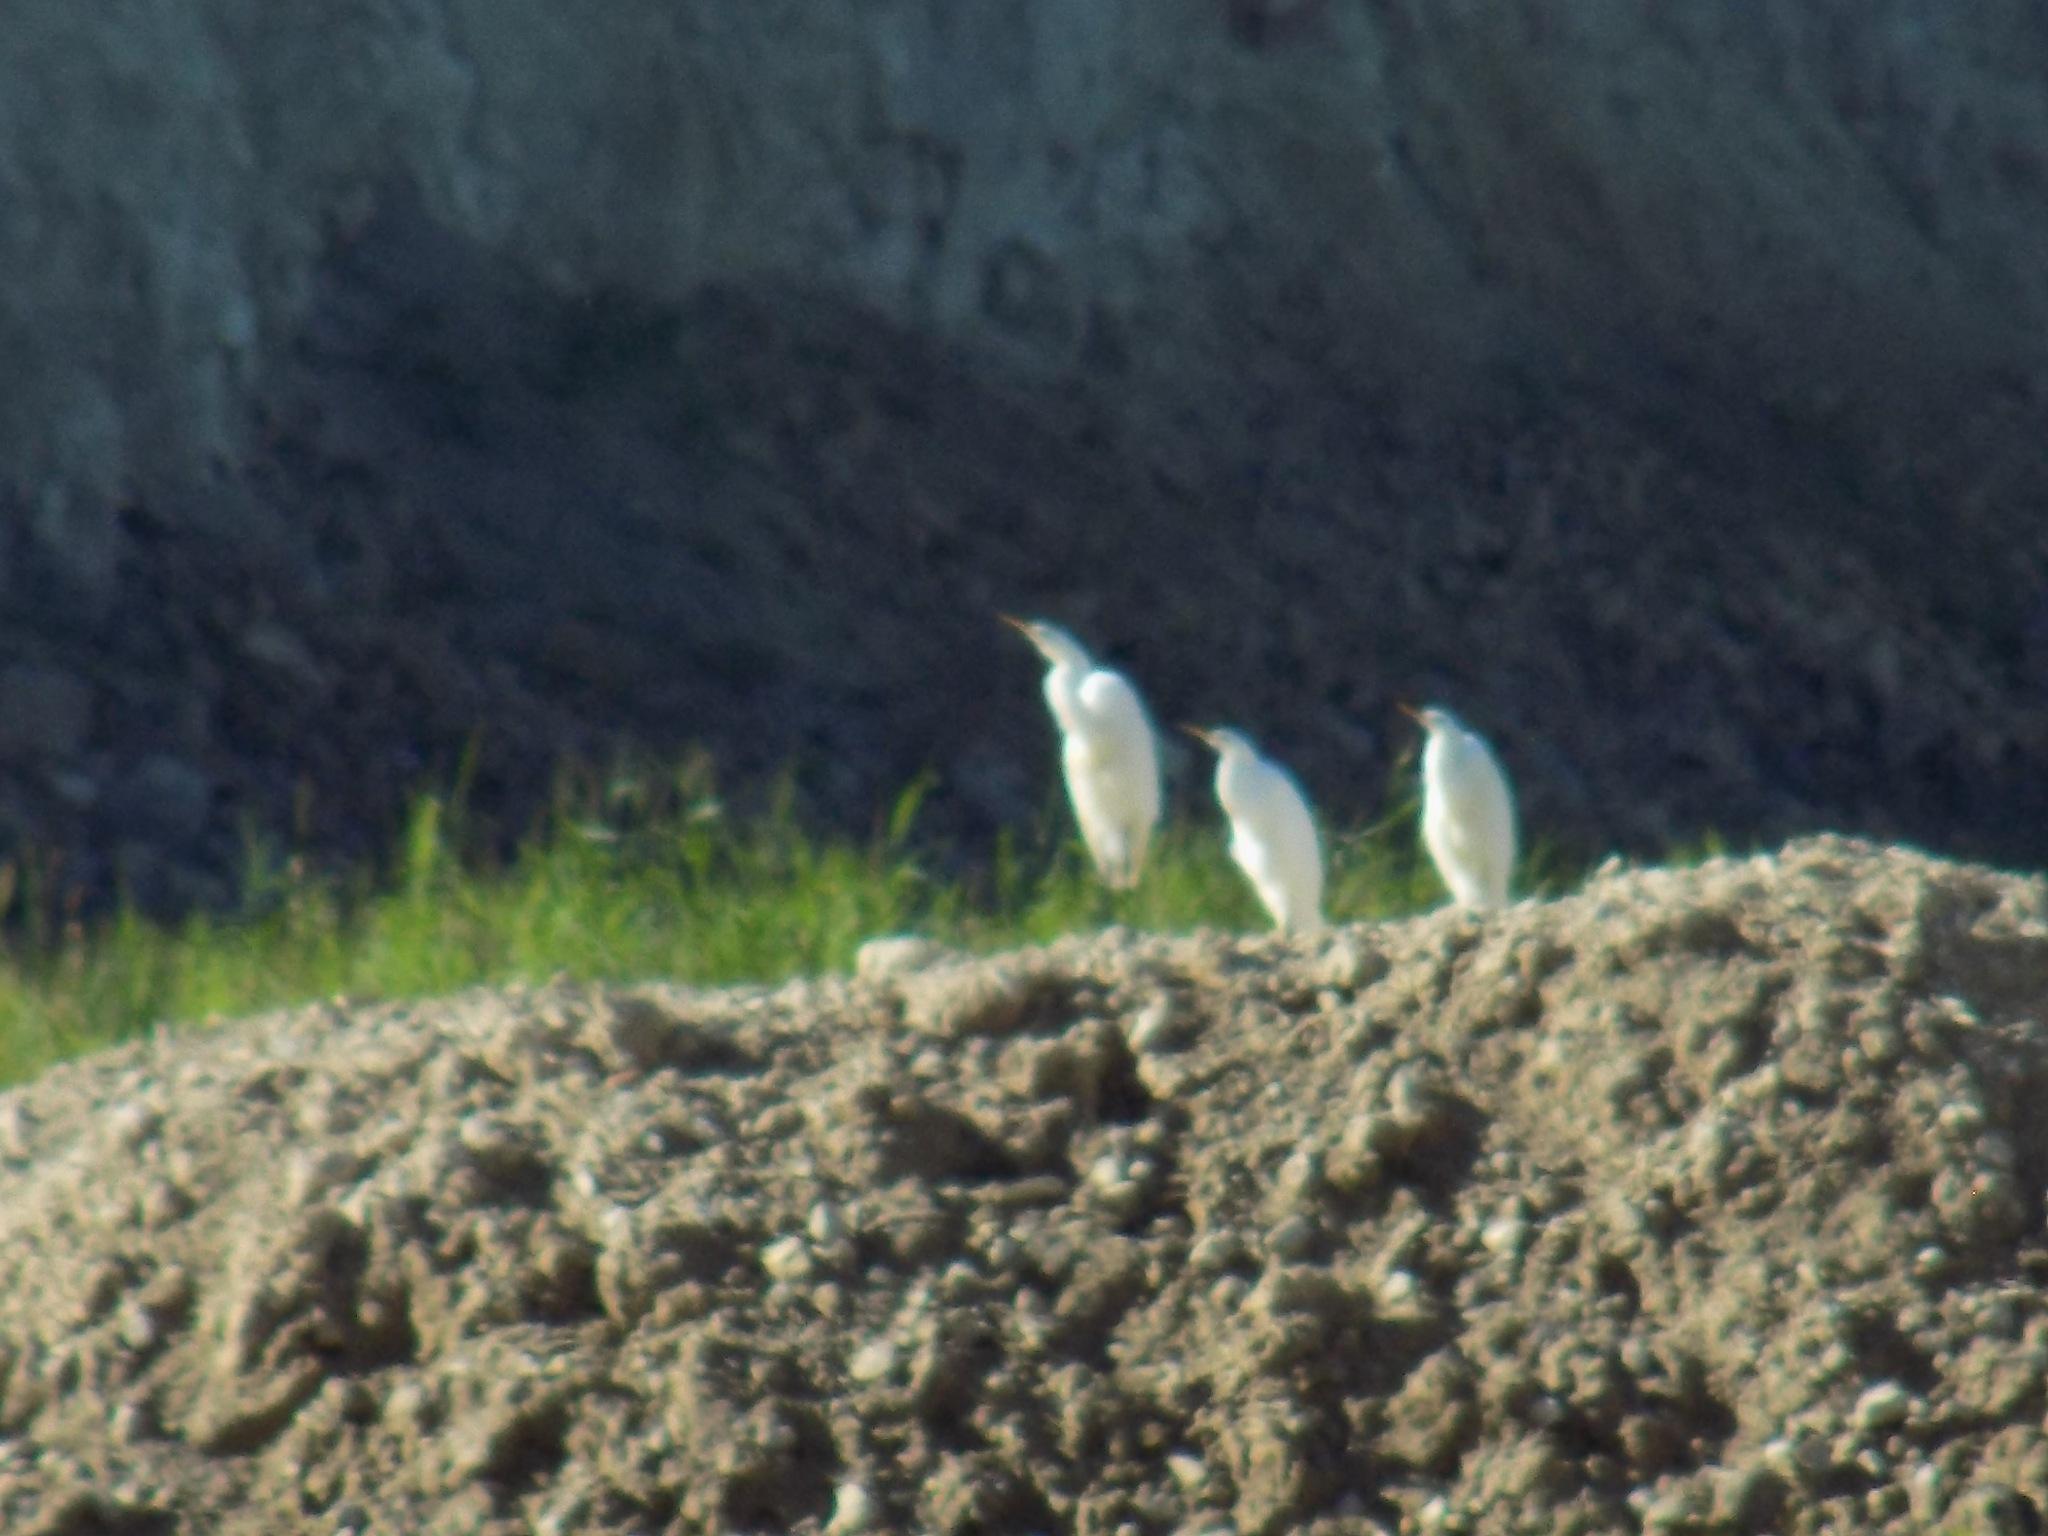 Birds in the distance by uzkuraitiene62